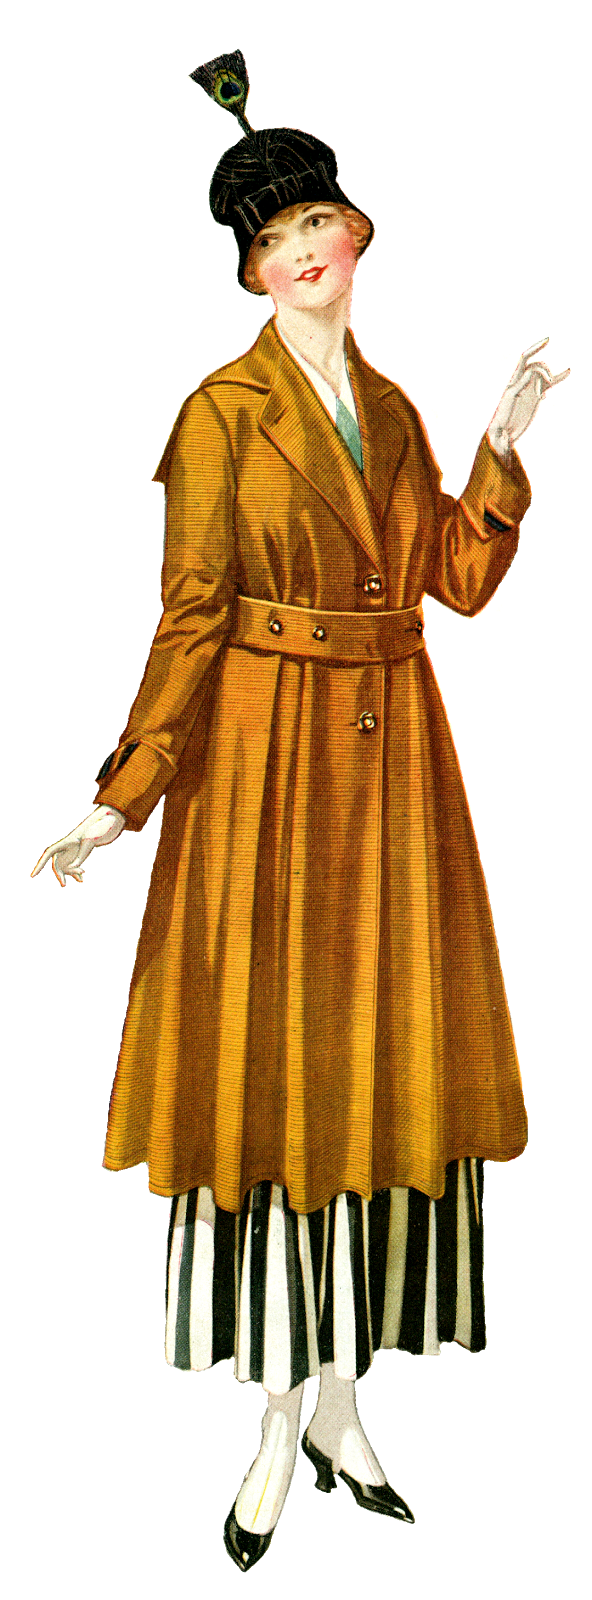 Fashion women vintage illustration. Winter clipart coat